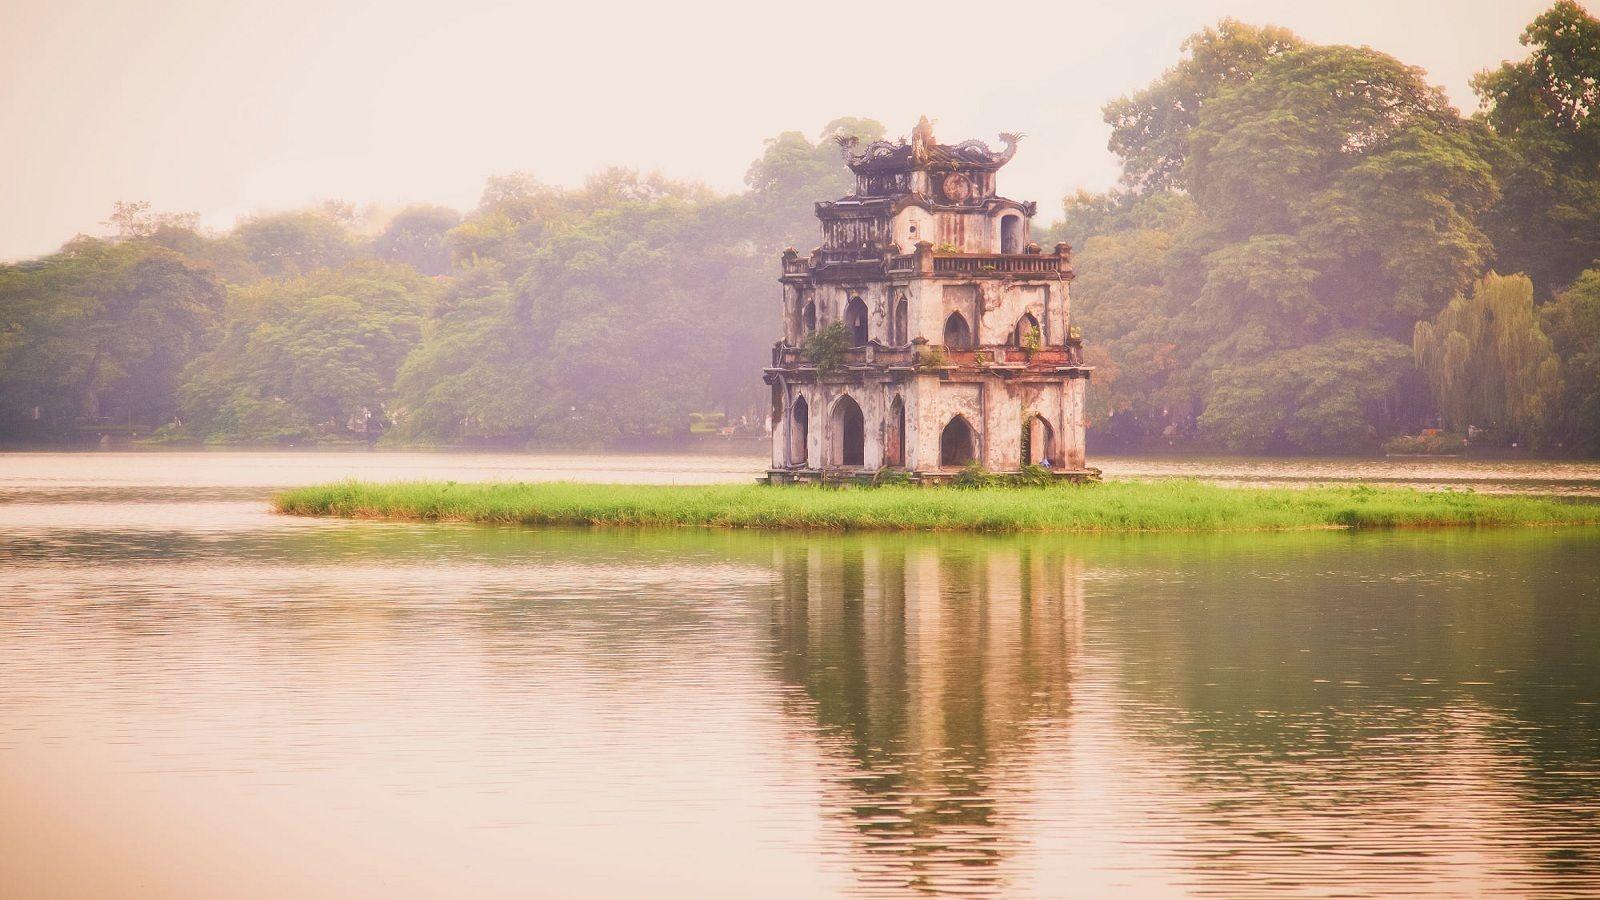 Temple on a lake island in Hanoi